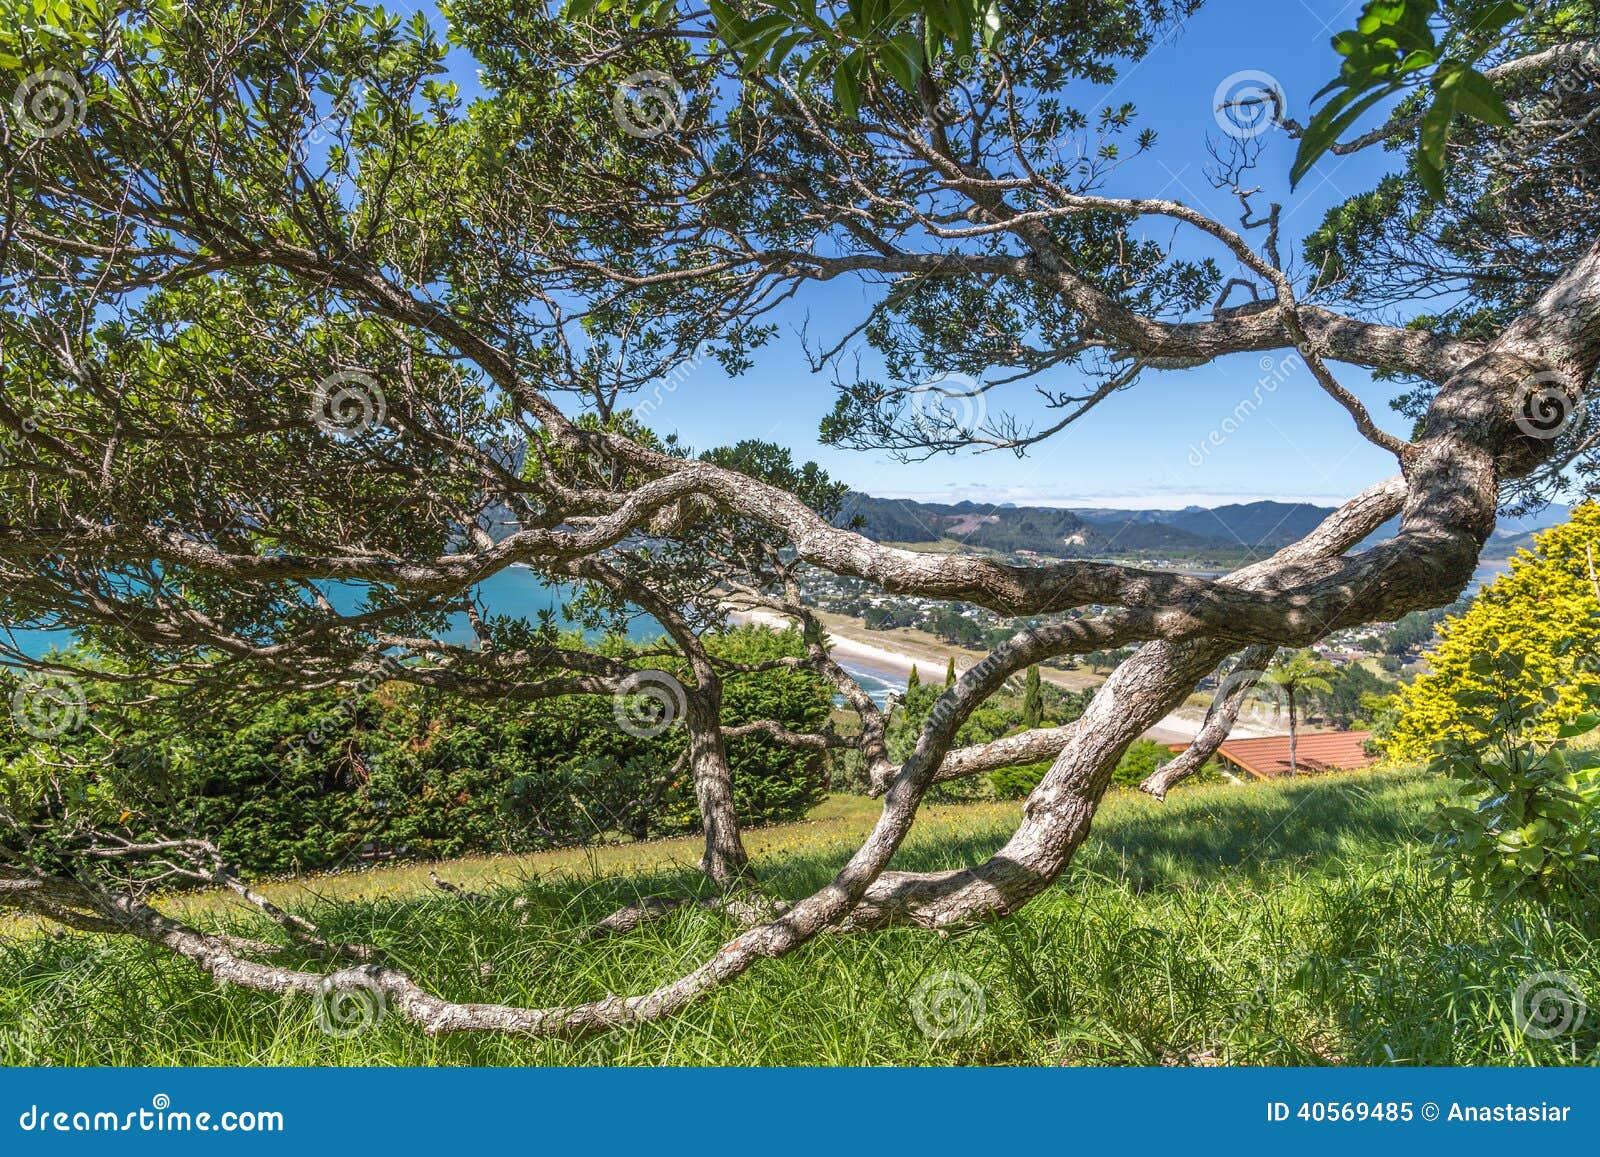 Pohutukawa tree crooked branch in a park on Paku mountain side, Tairua ...